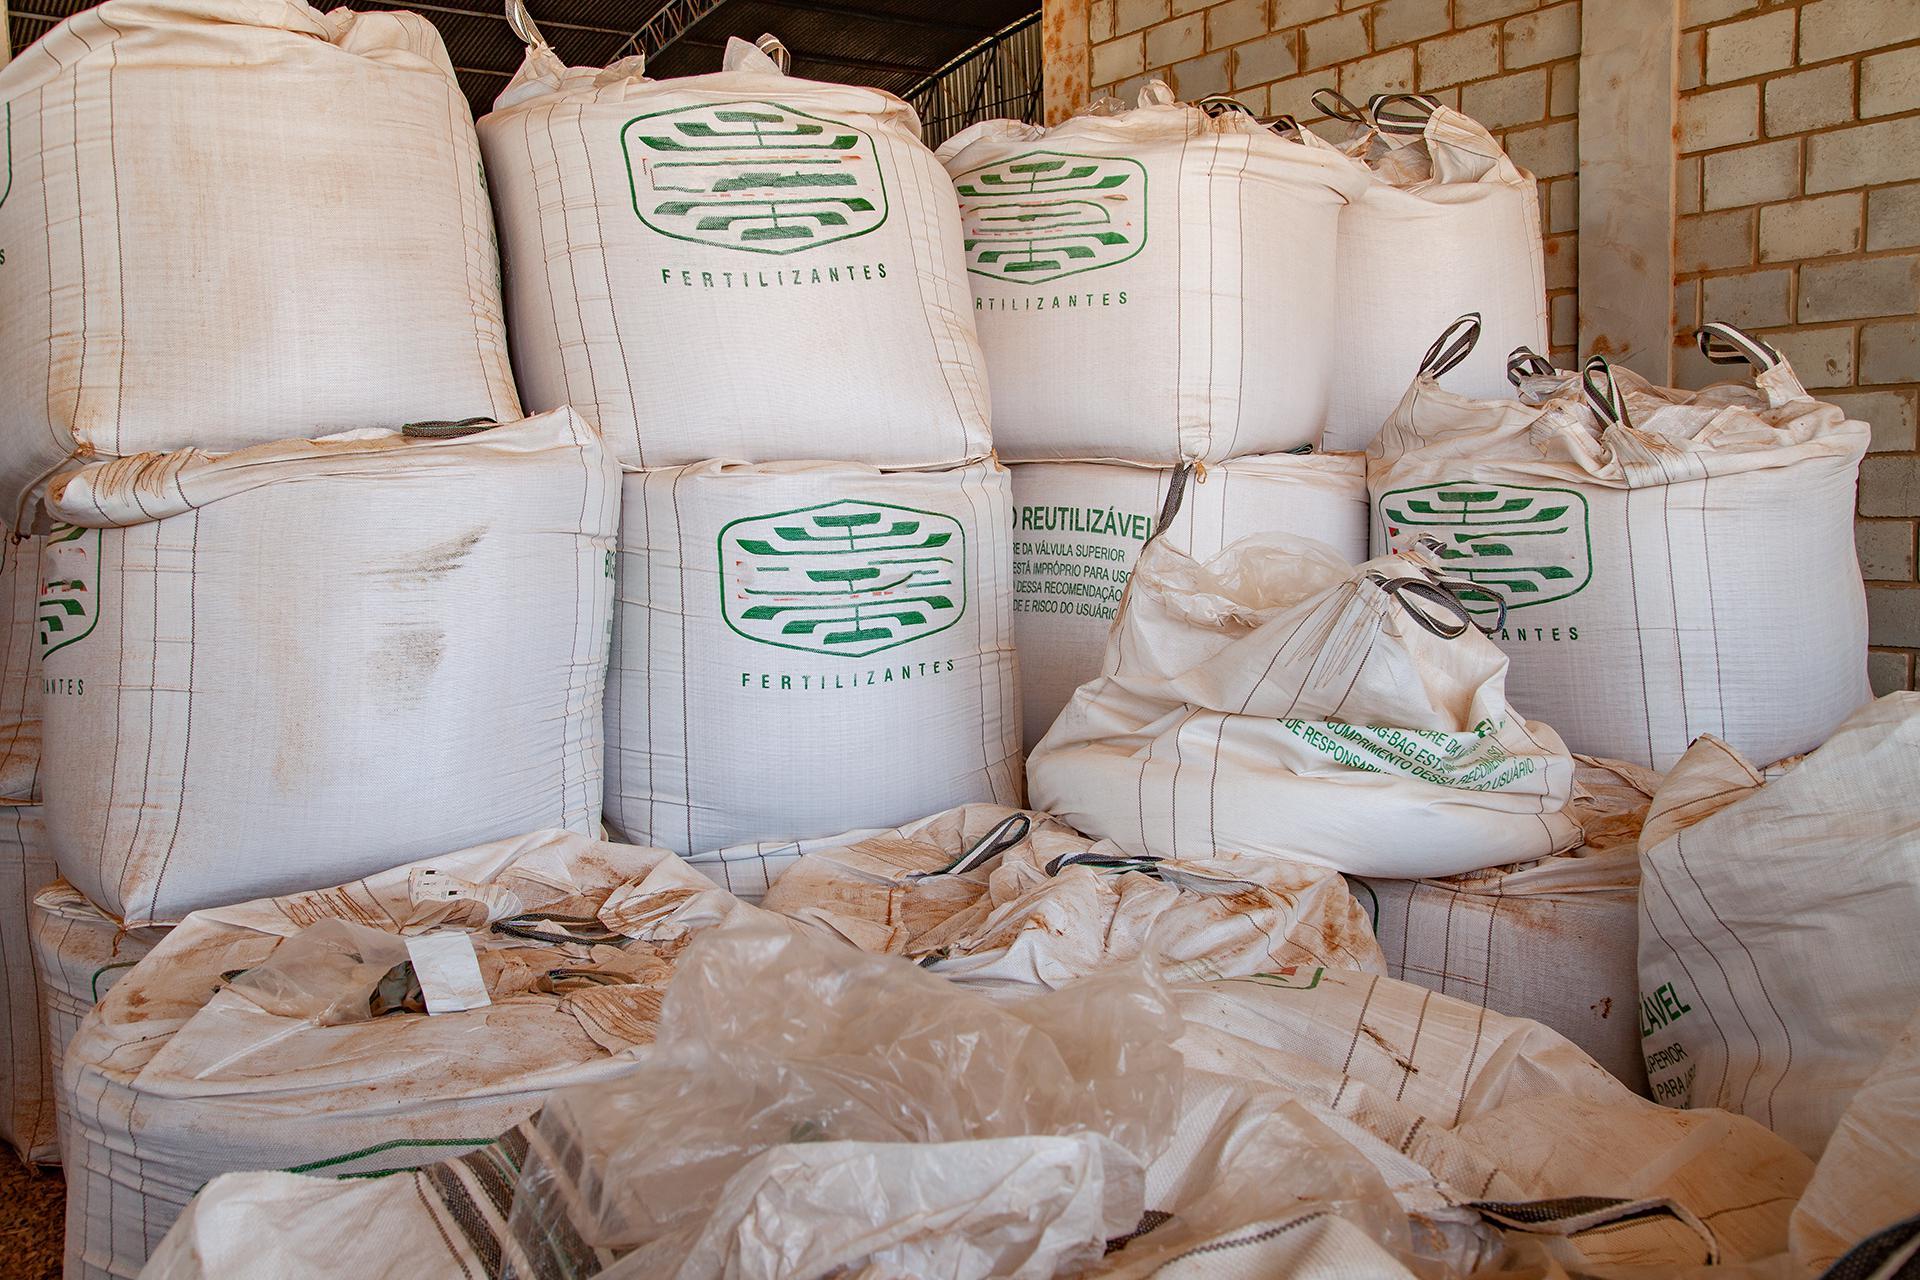 fertilizantes insumos autocontrole